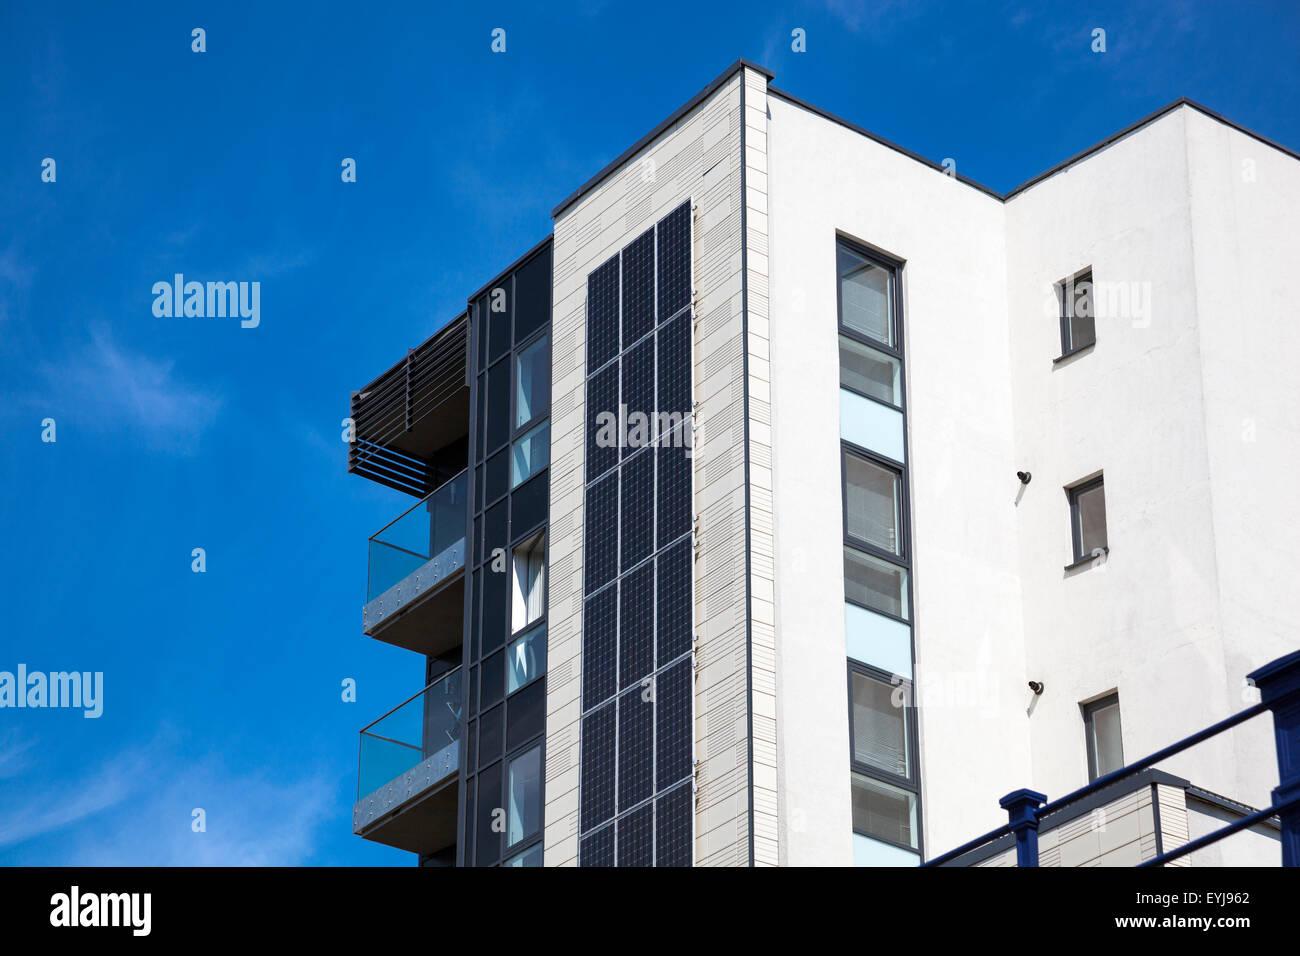 Solar Panel On Side Of Building : Modern apartment building with solar panels on the side